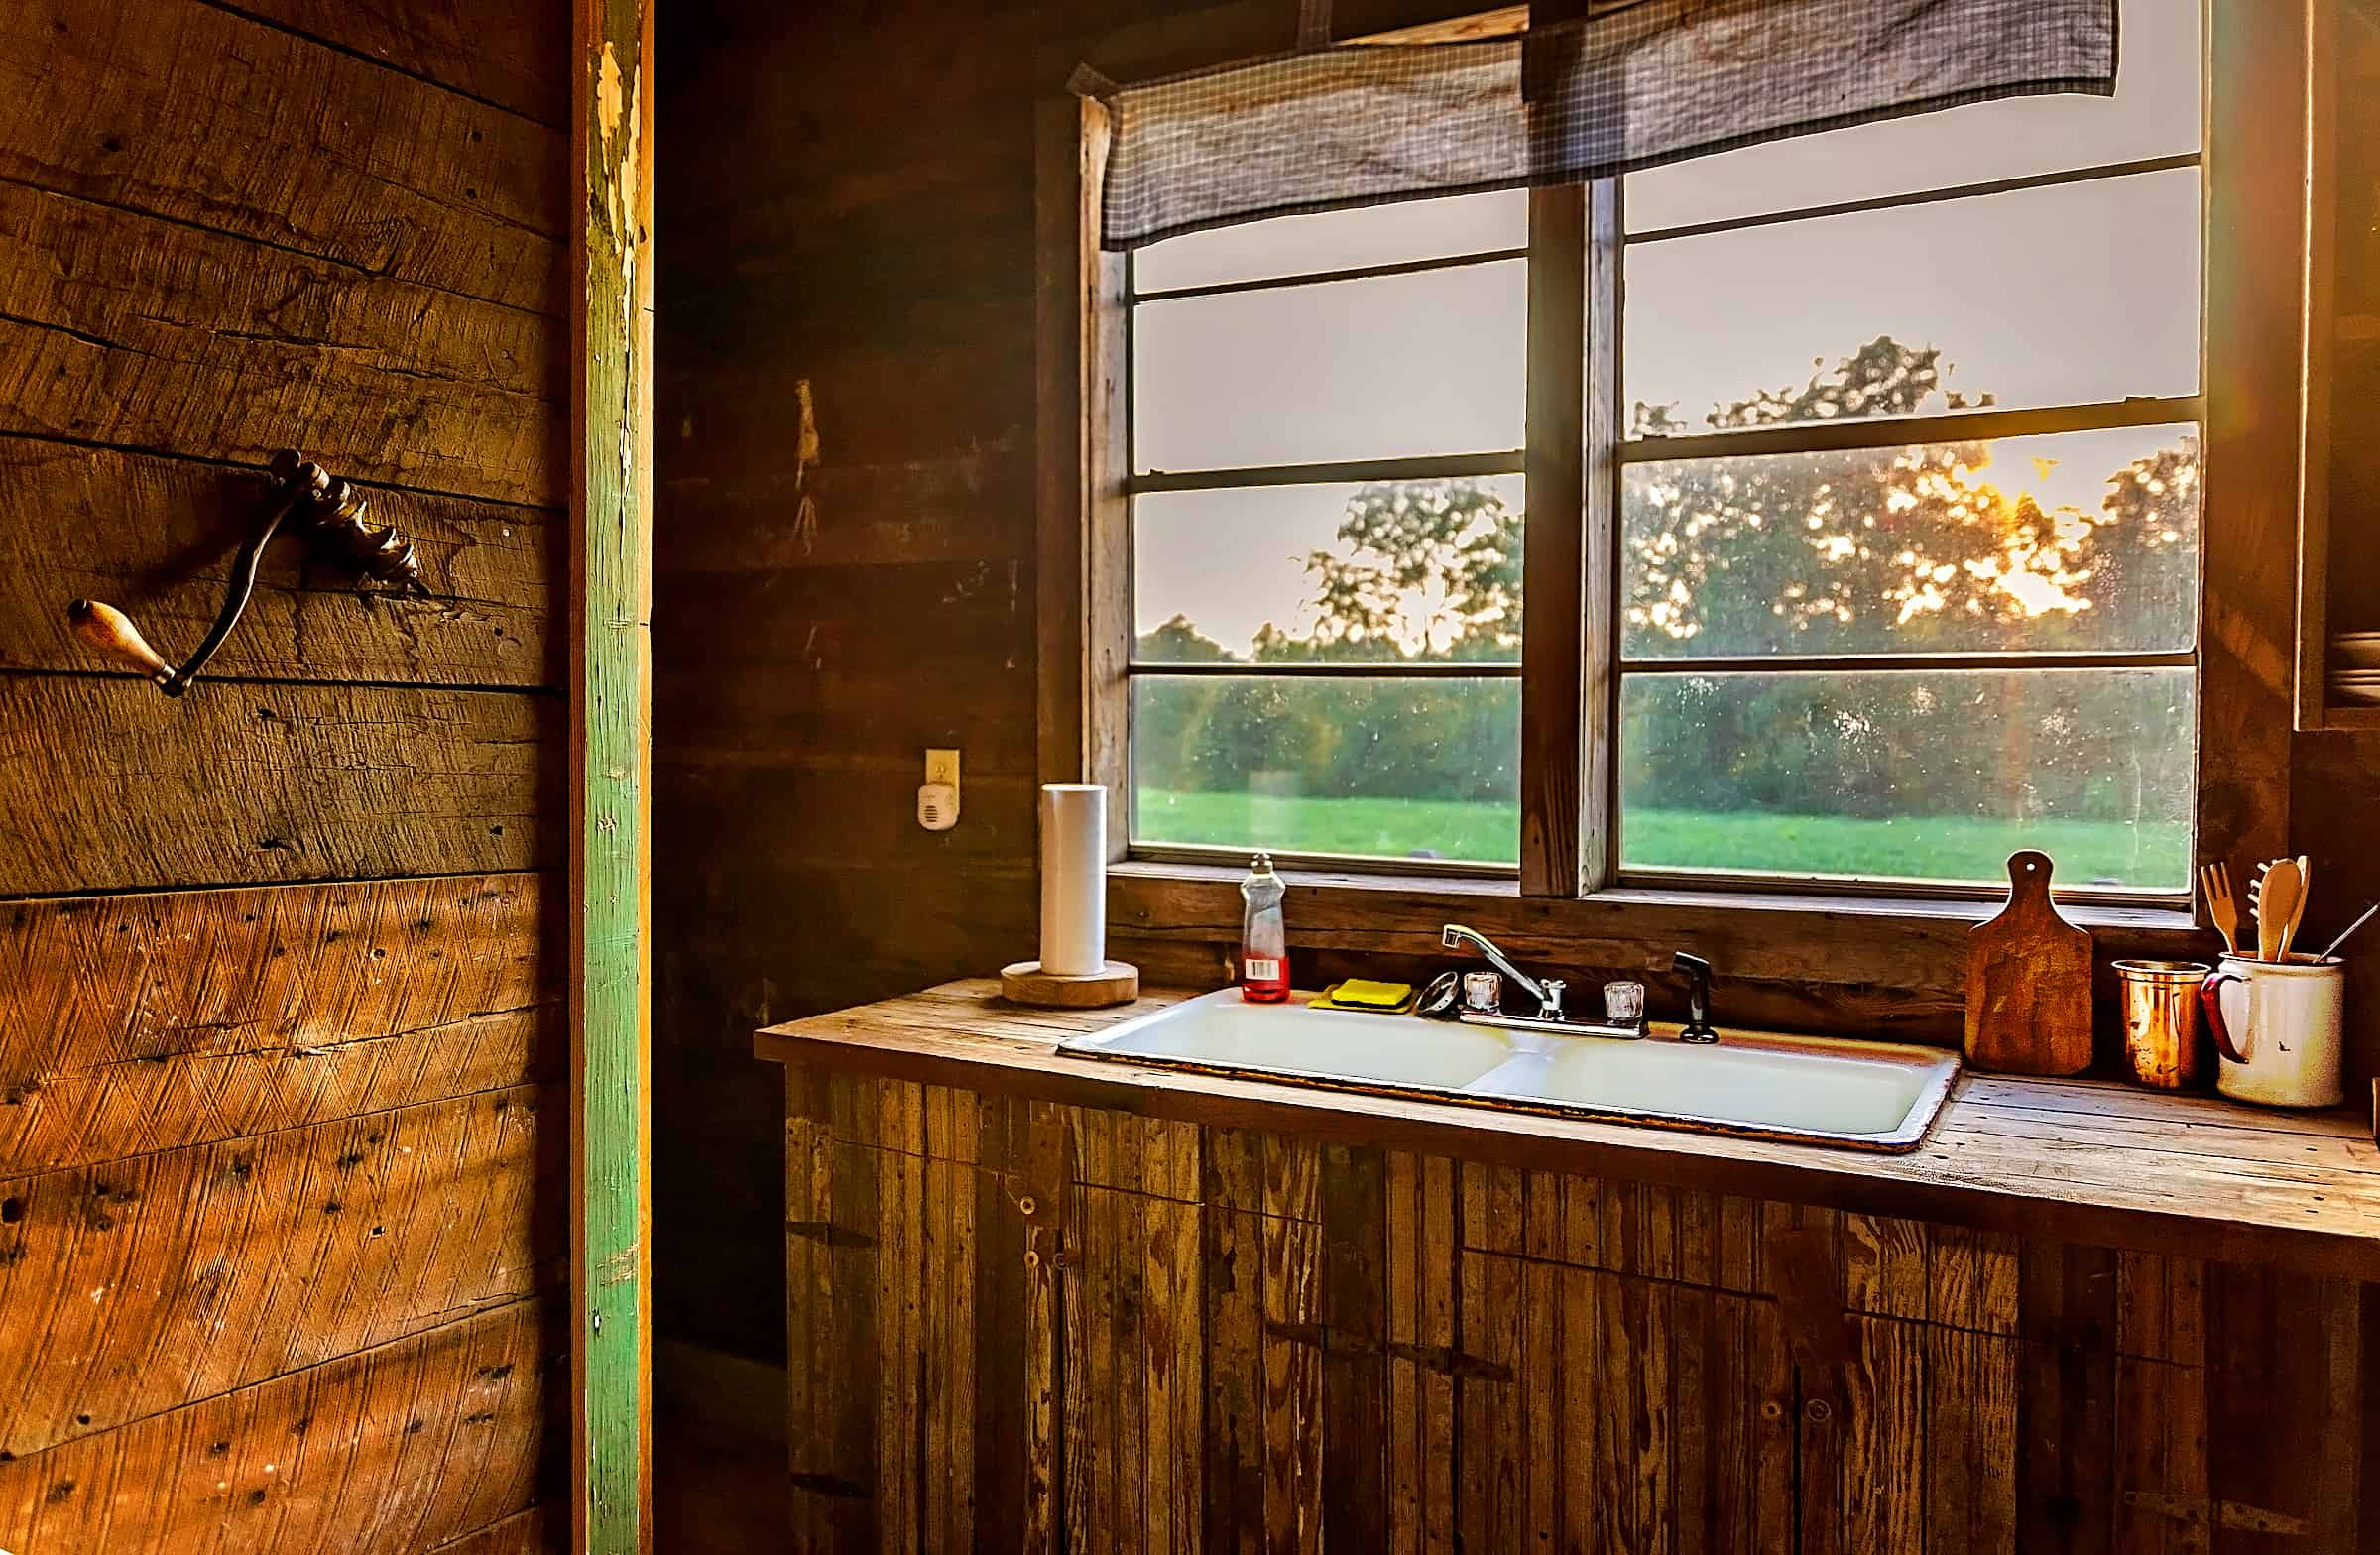 Kitchen at Tallahatchie Flats Bush Hog's House